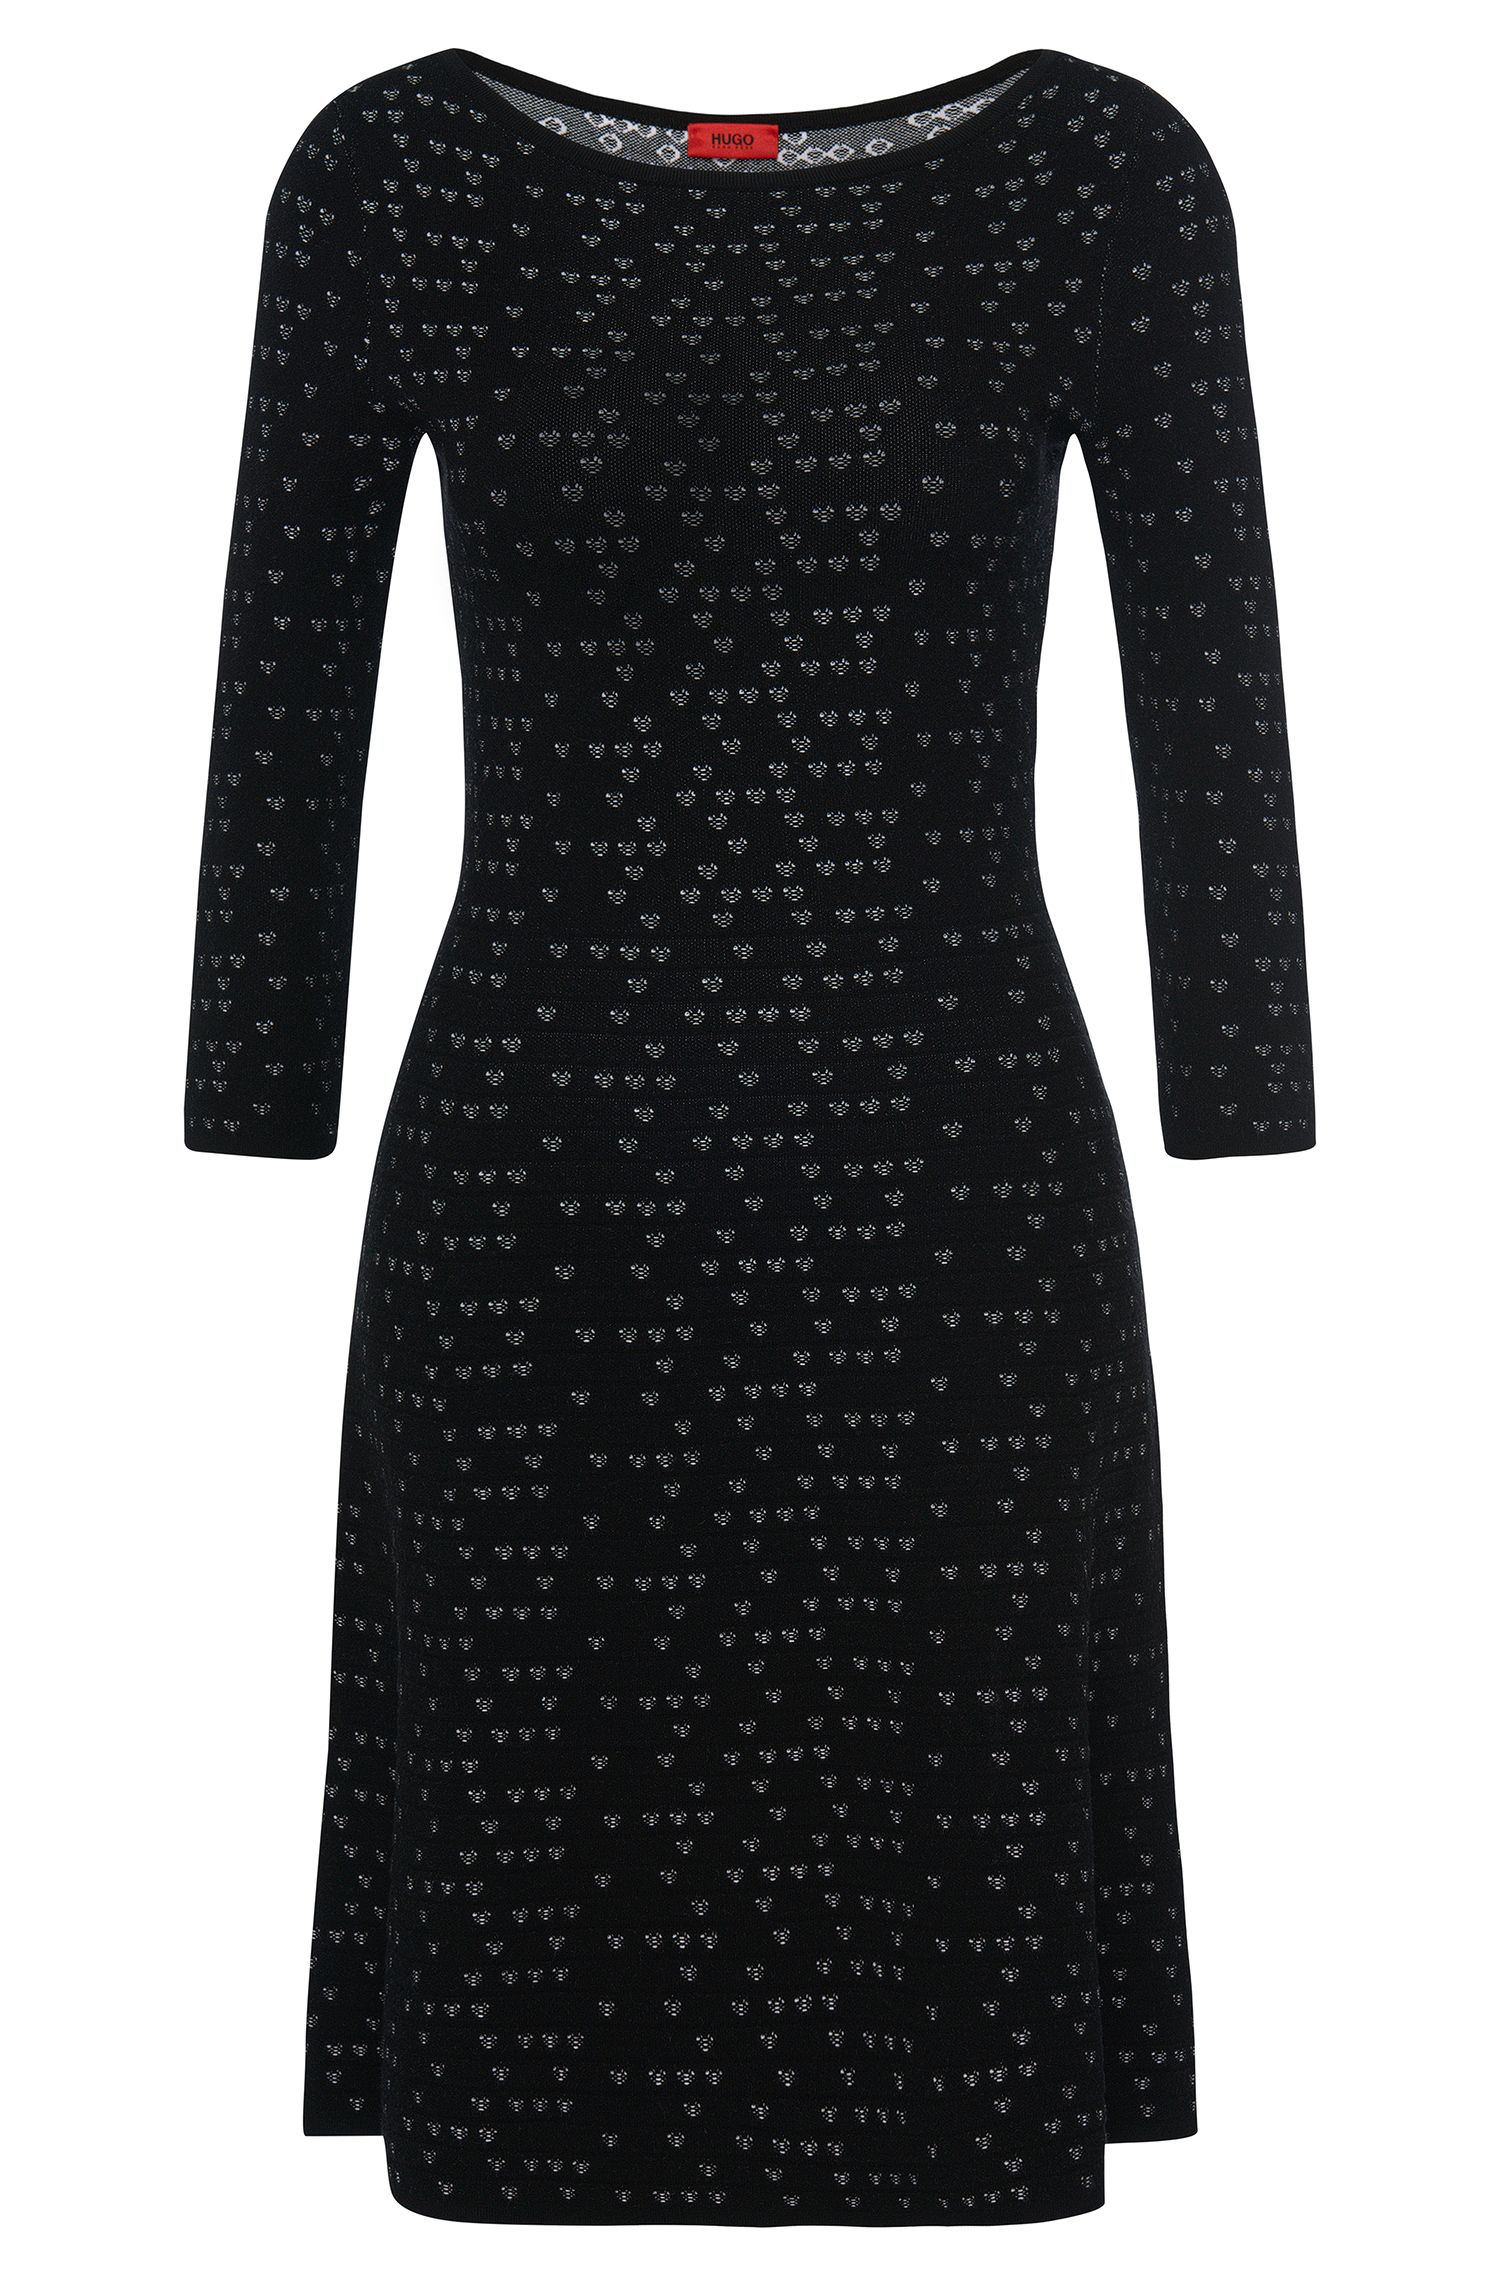 'Serita'   Viscose Patterned Knit Dress